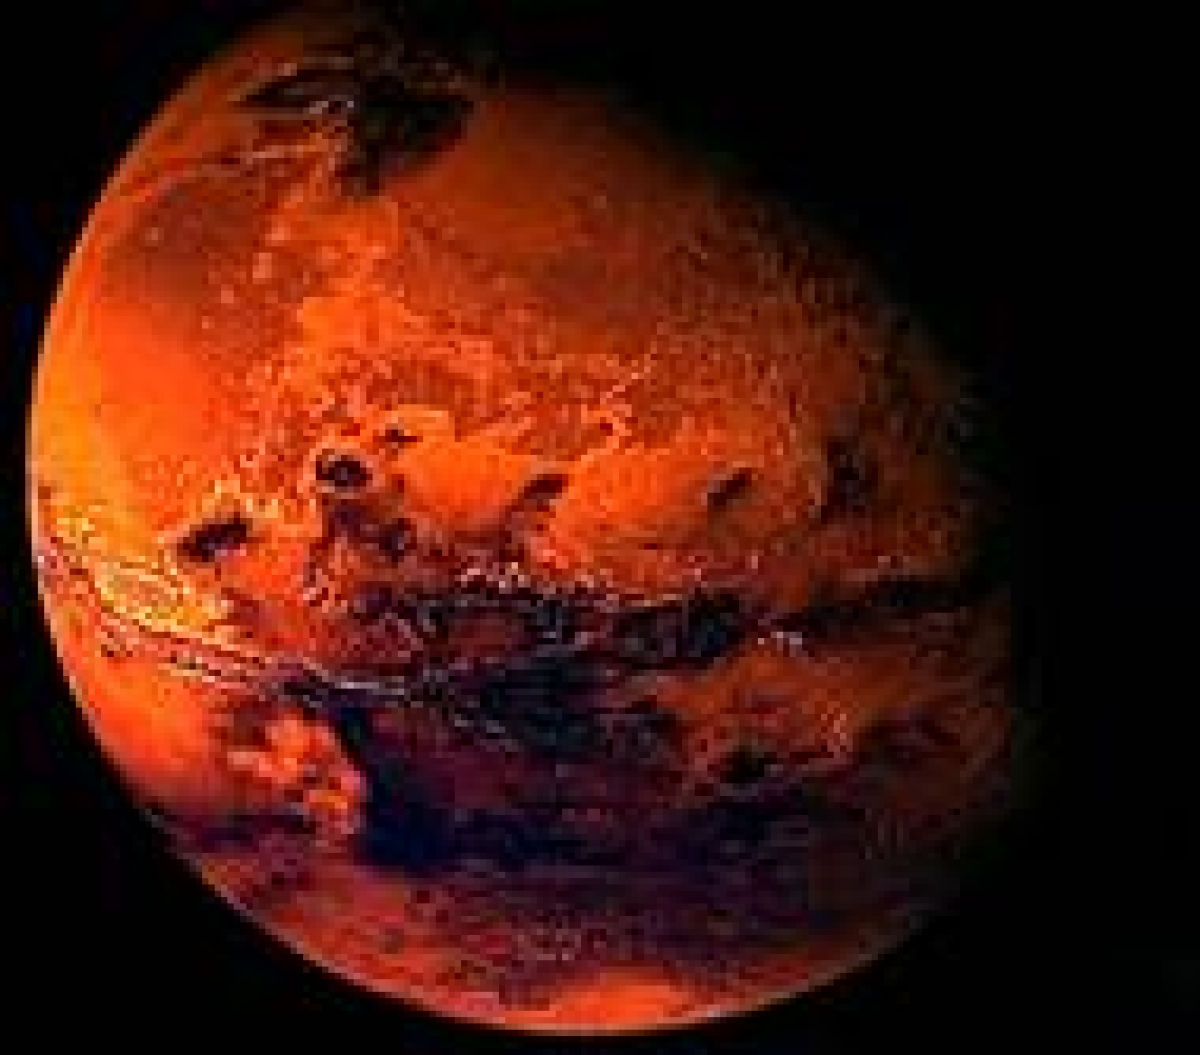 NASA, Microsoft team up to bring you closer to Mars